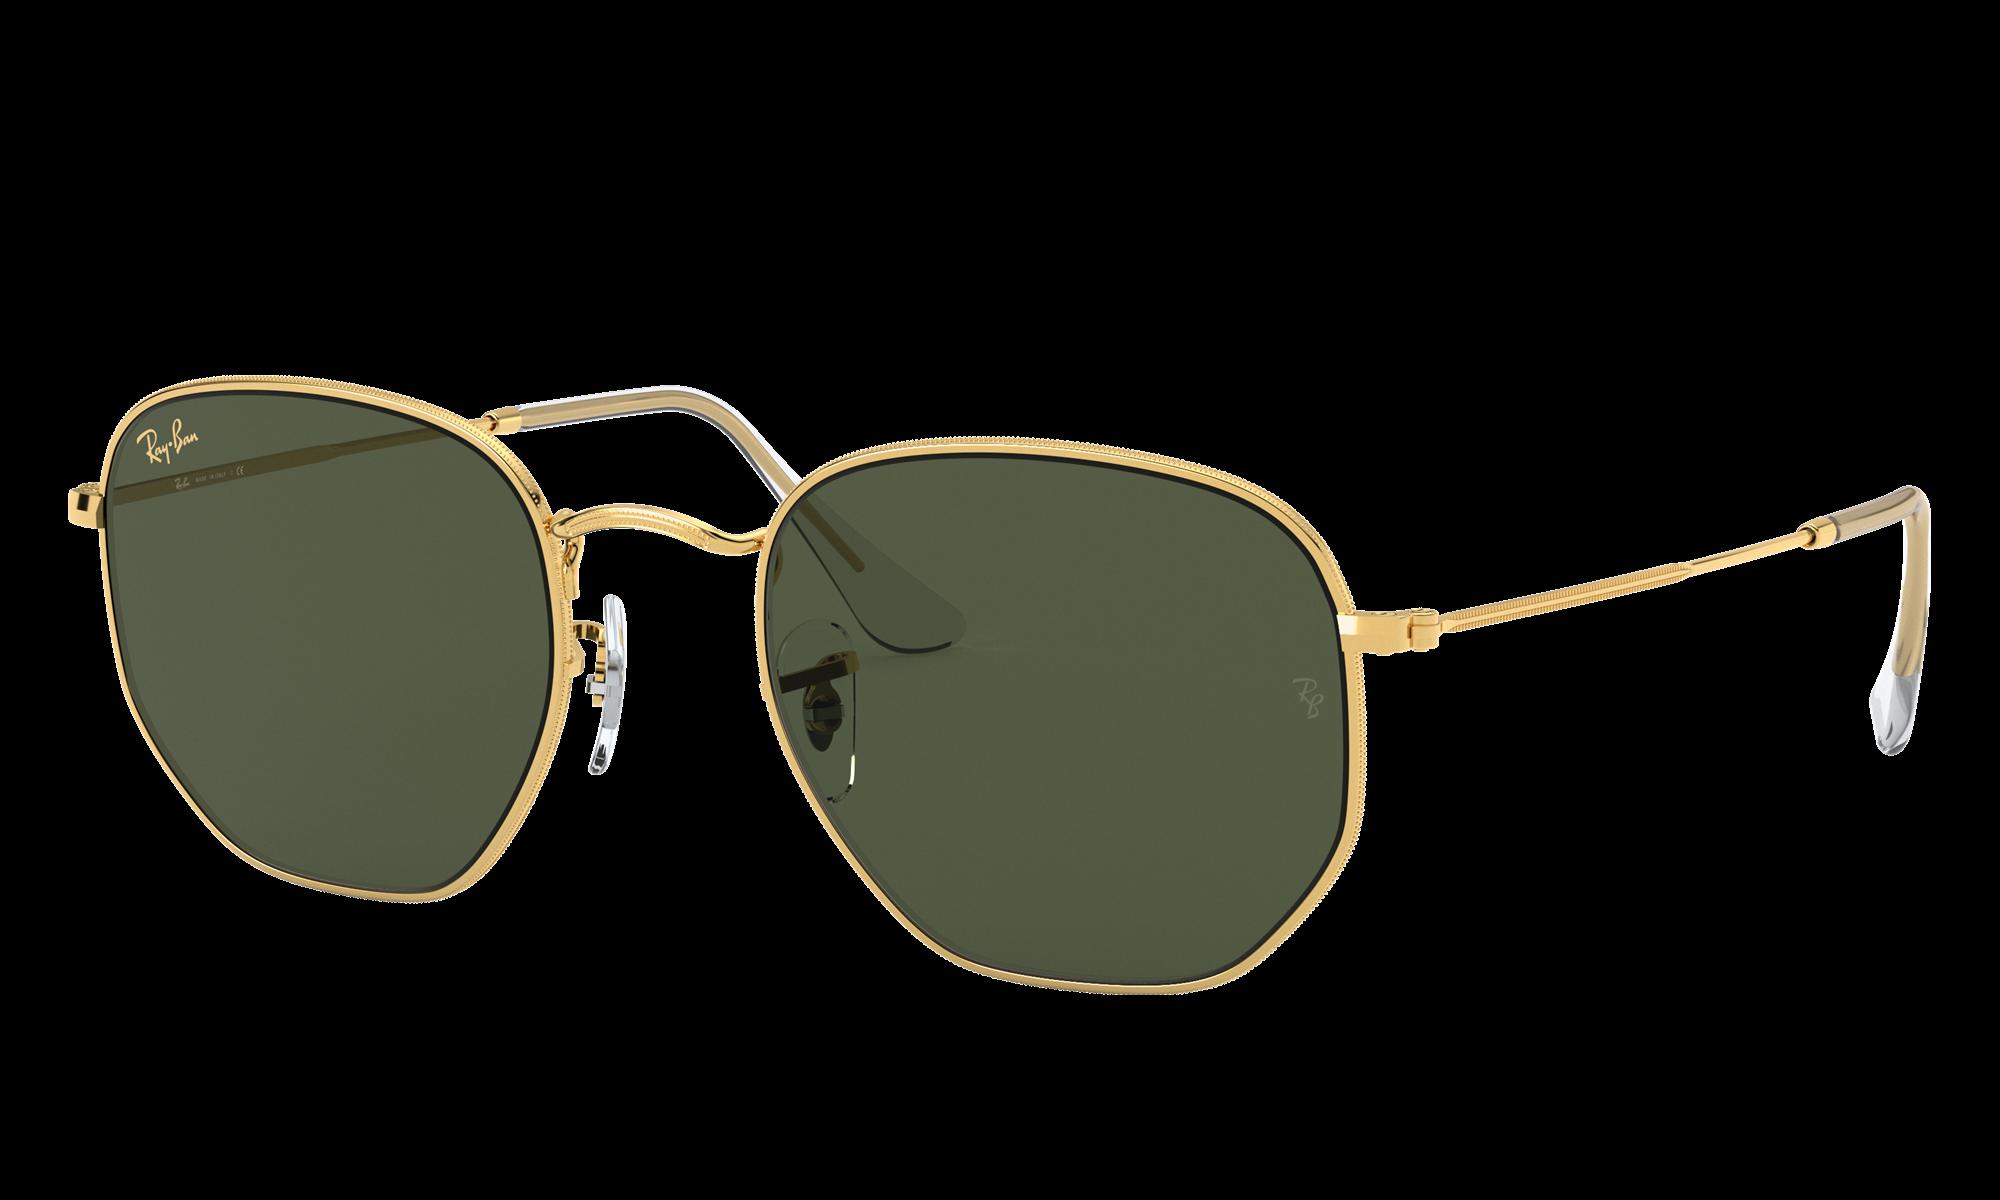 1960s Sunglasses | 70s Sunglasses, 70s Glasses Ray-Ban Unisex Hexagonal Legend Gold Gold Size Standard $154.00 AT vintagedancer.com